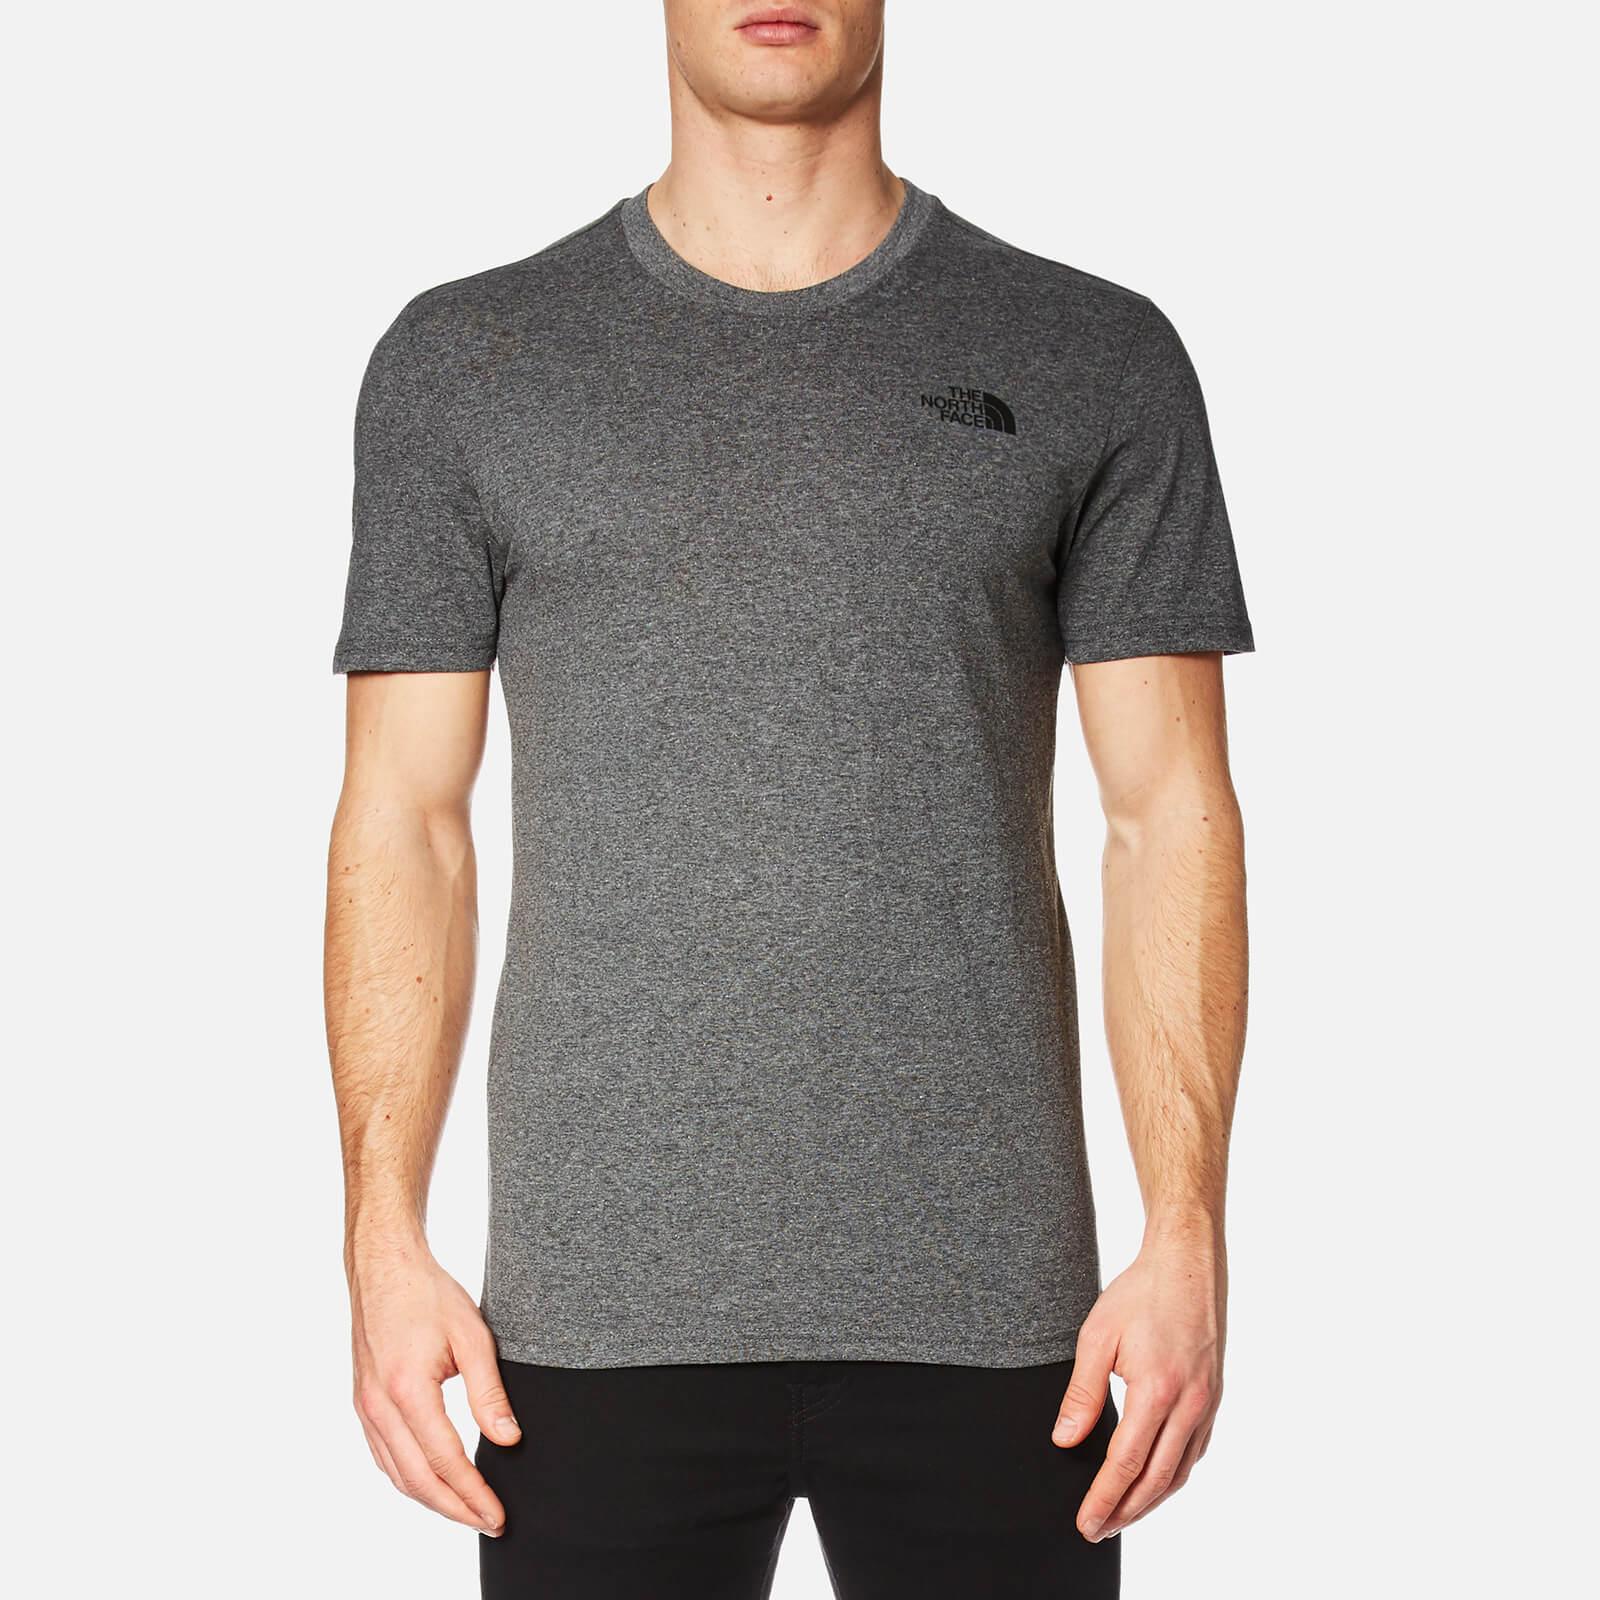 f173b18b The North Face Men's Simple Dome Short Sleeve T-Shirt - Medium Grey Heather  Clothing | TheHut.com